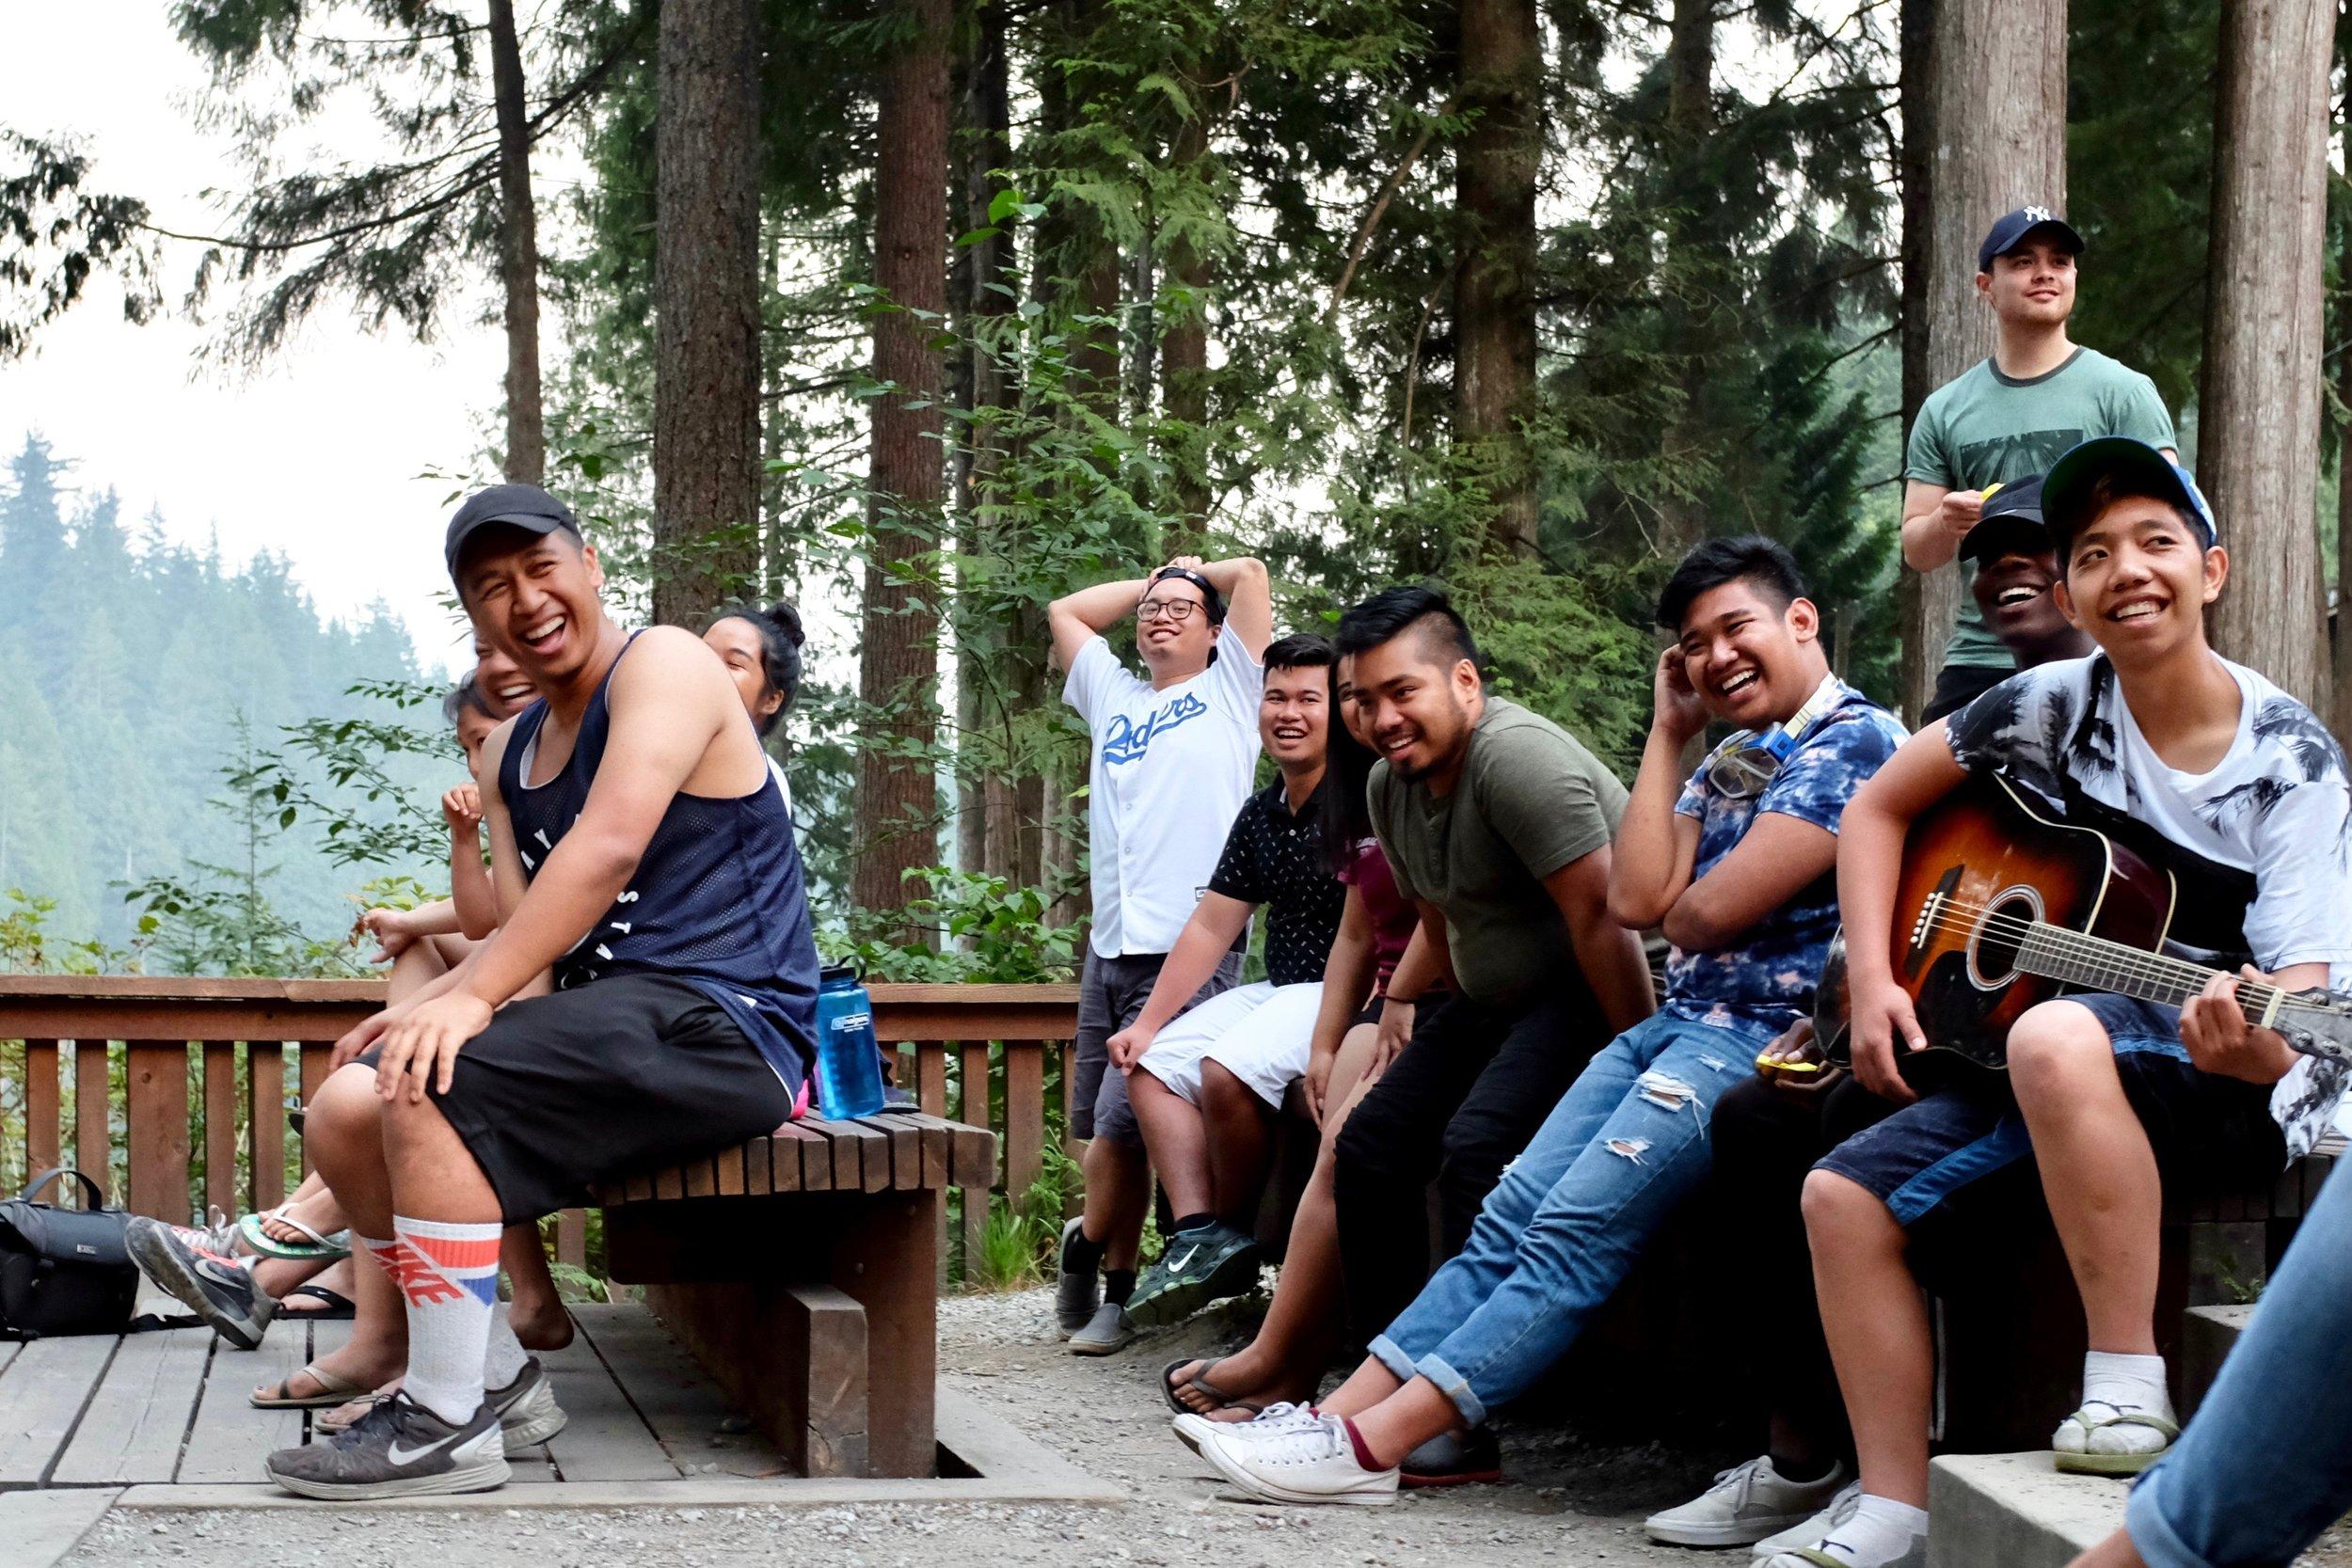 KAMP mentors and mentees sharing a laugh during group skits. Photo by J. Austria